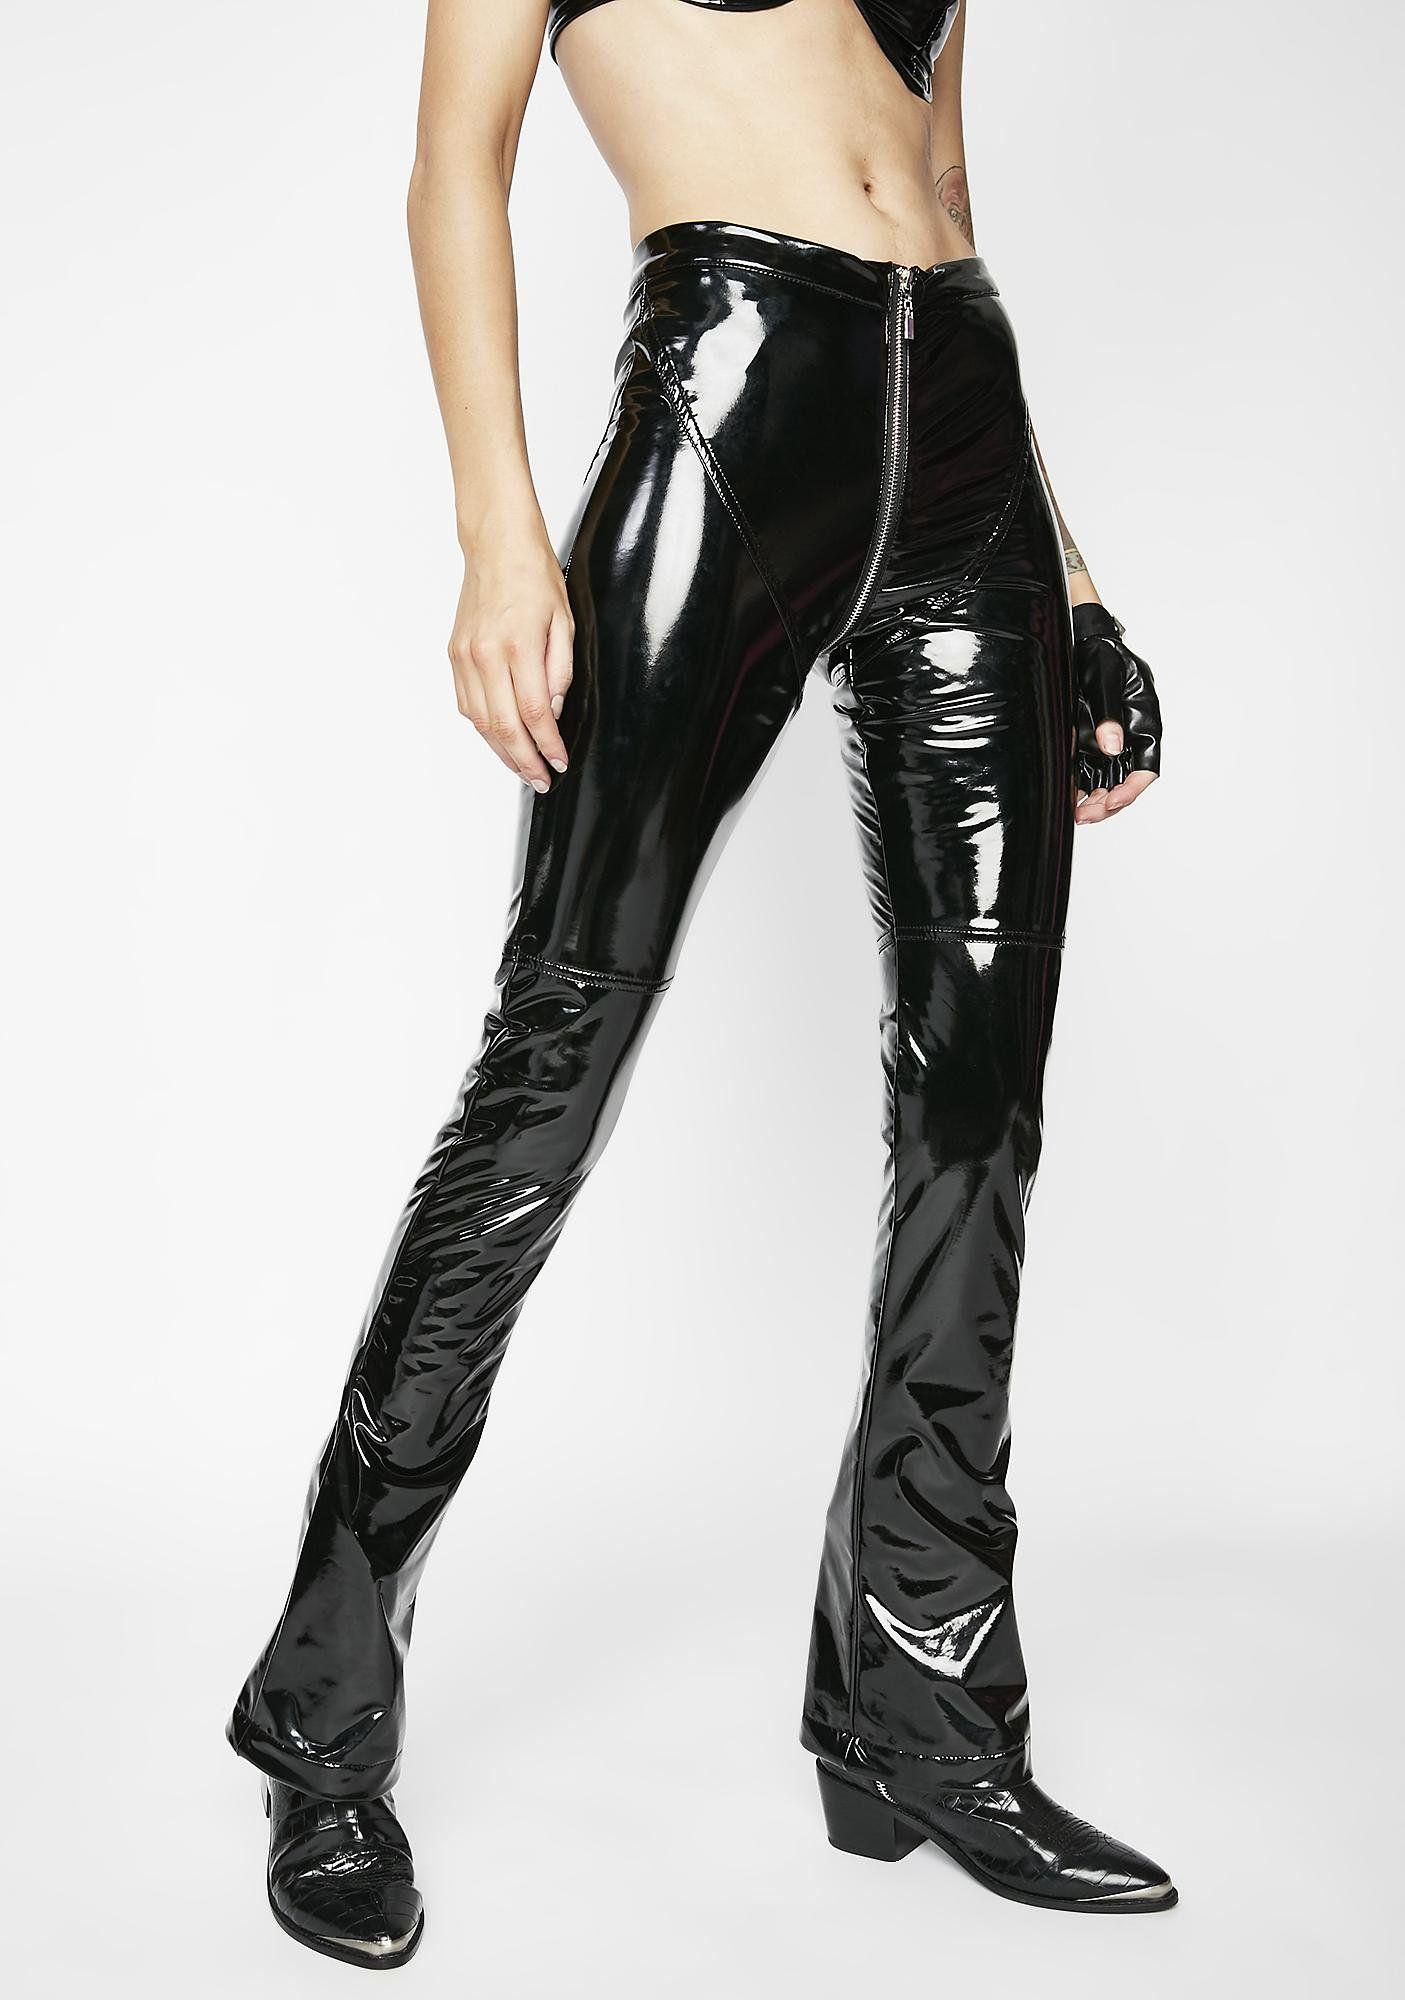 59684200d67 Matte Dark Siren PVC Pants cuz you got the smoke alarms goin  off. These shiny  black pants have a mid-rise fit